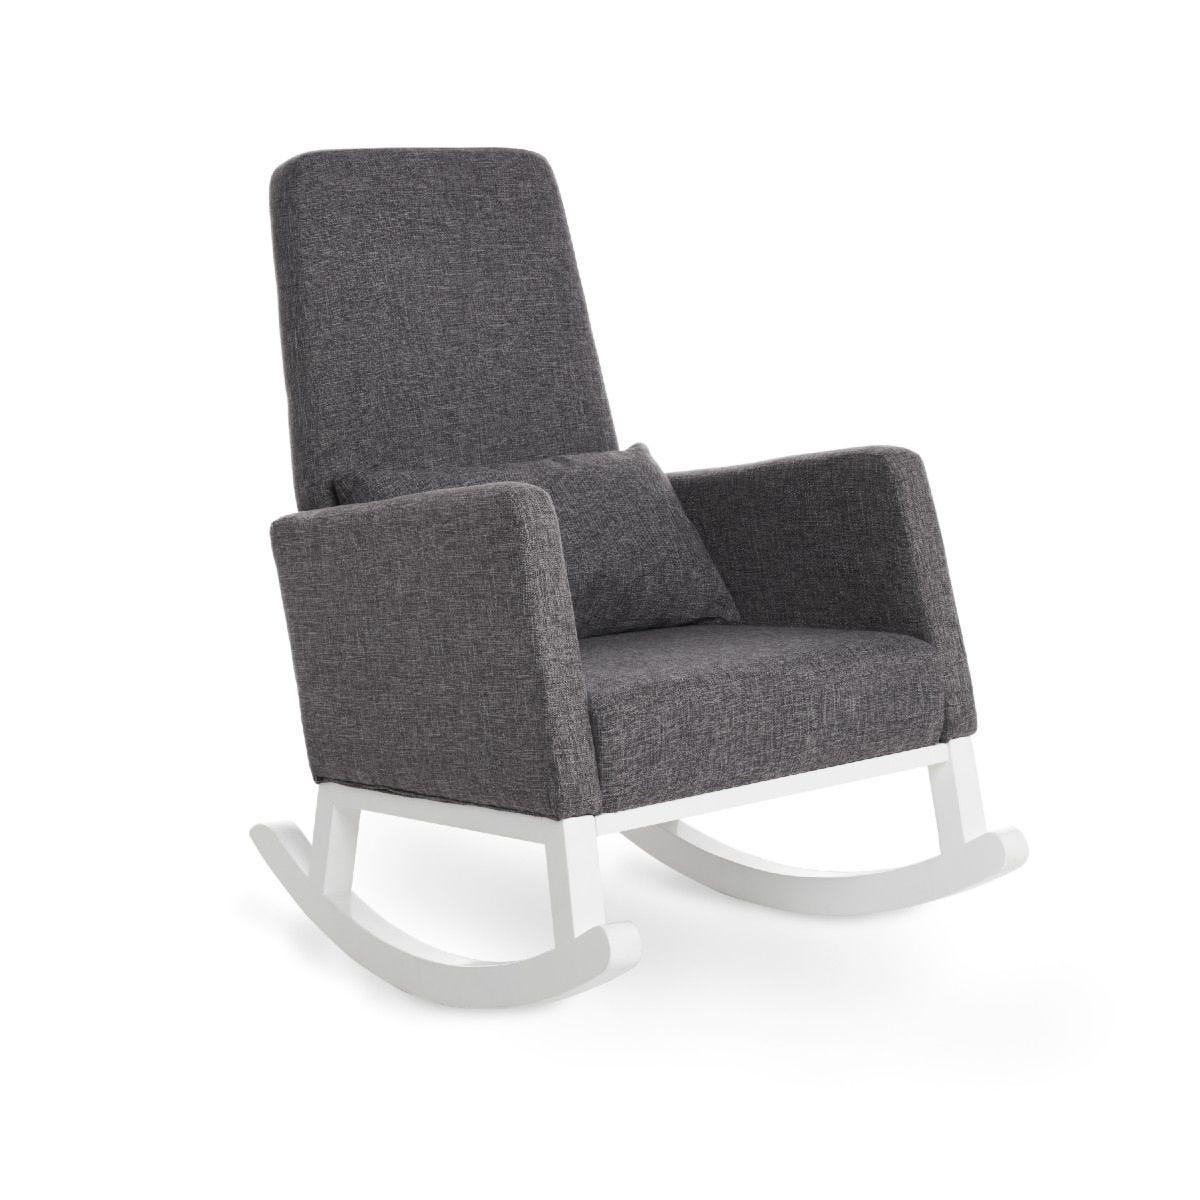 OBaby High Back Rocking Chair Grey